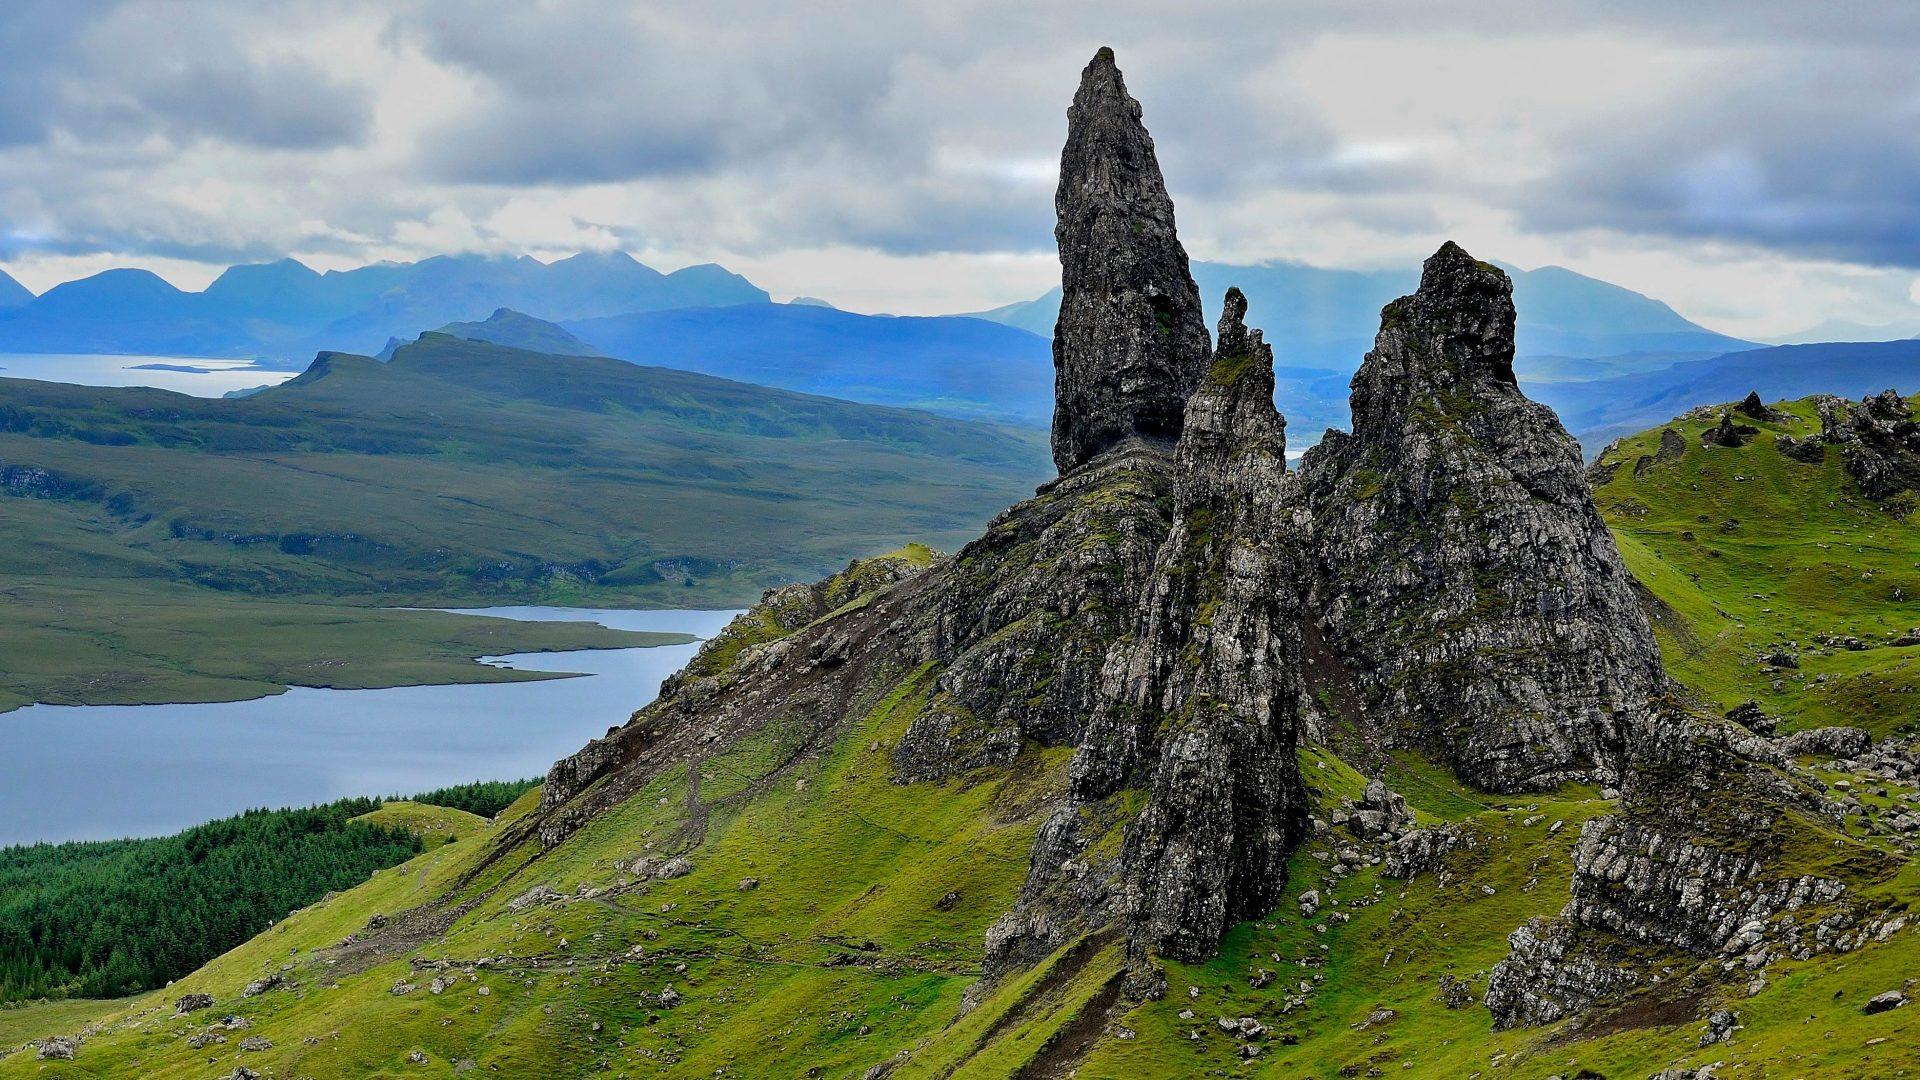 Rugged landscape of the Isle of Skye, Scotland